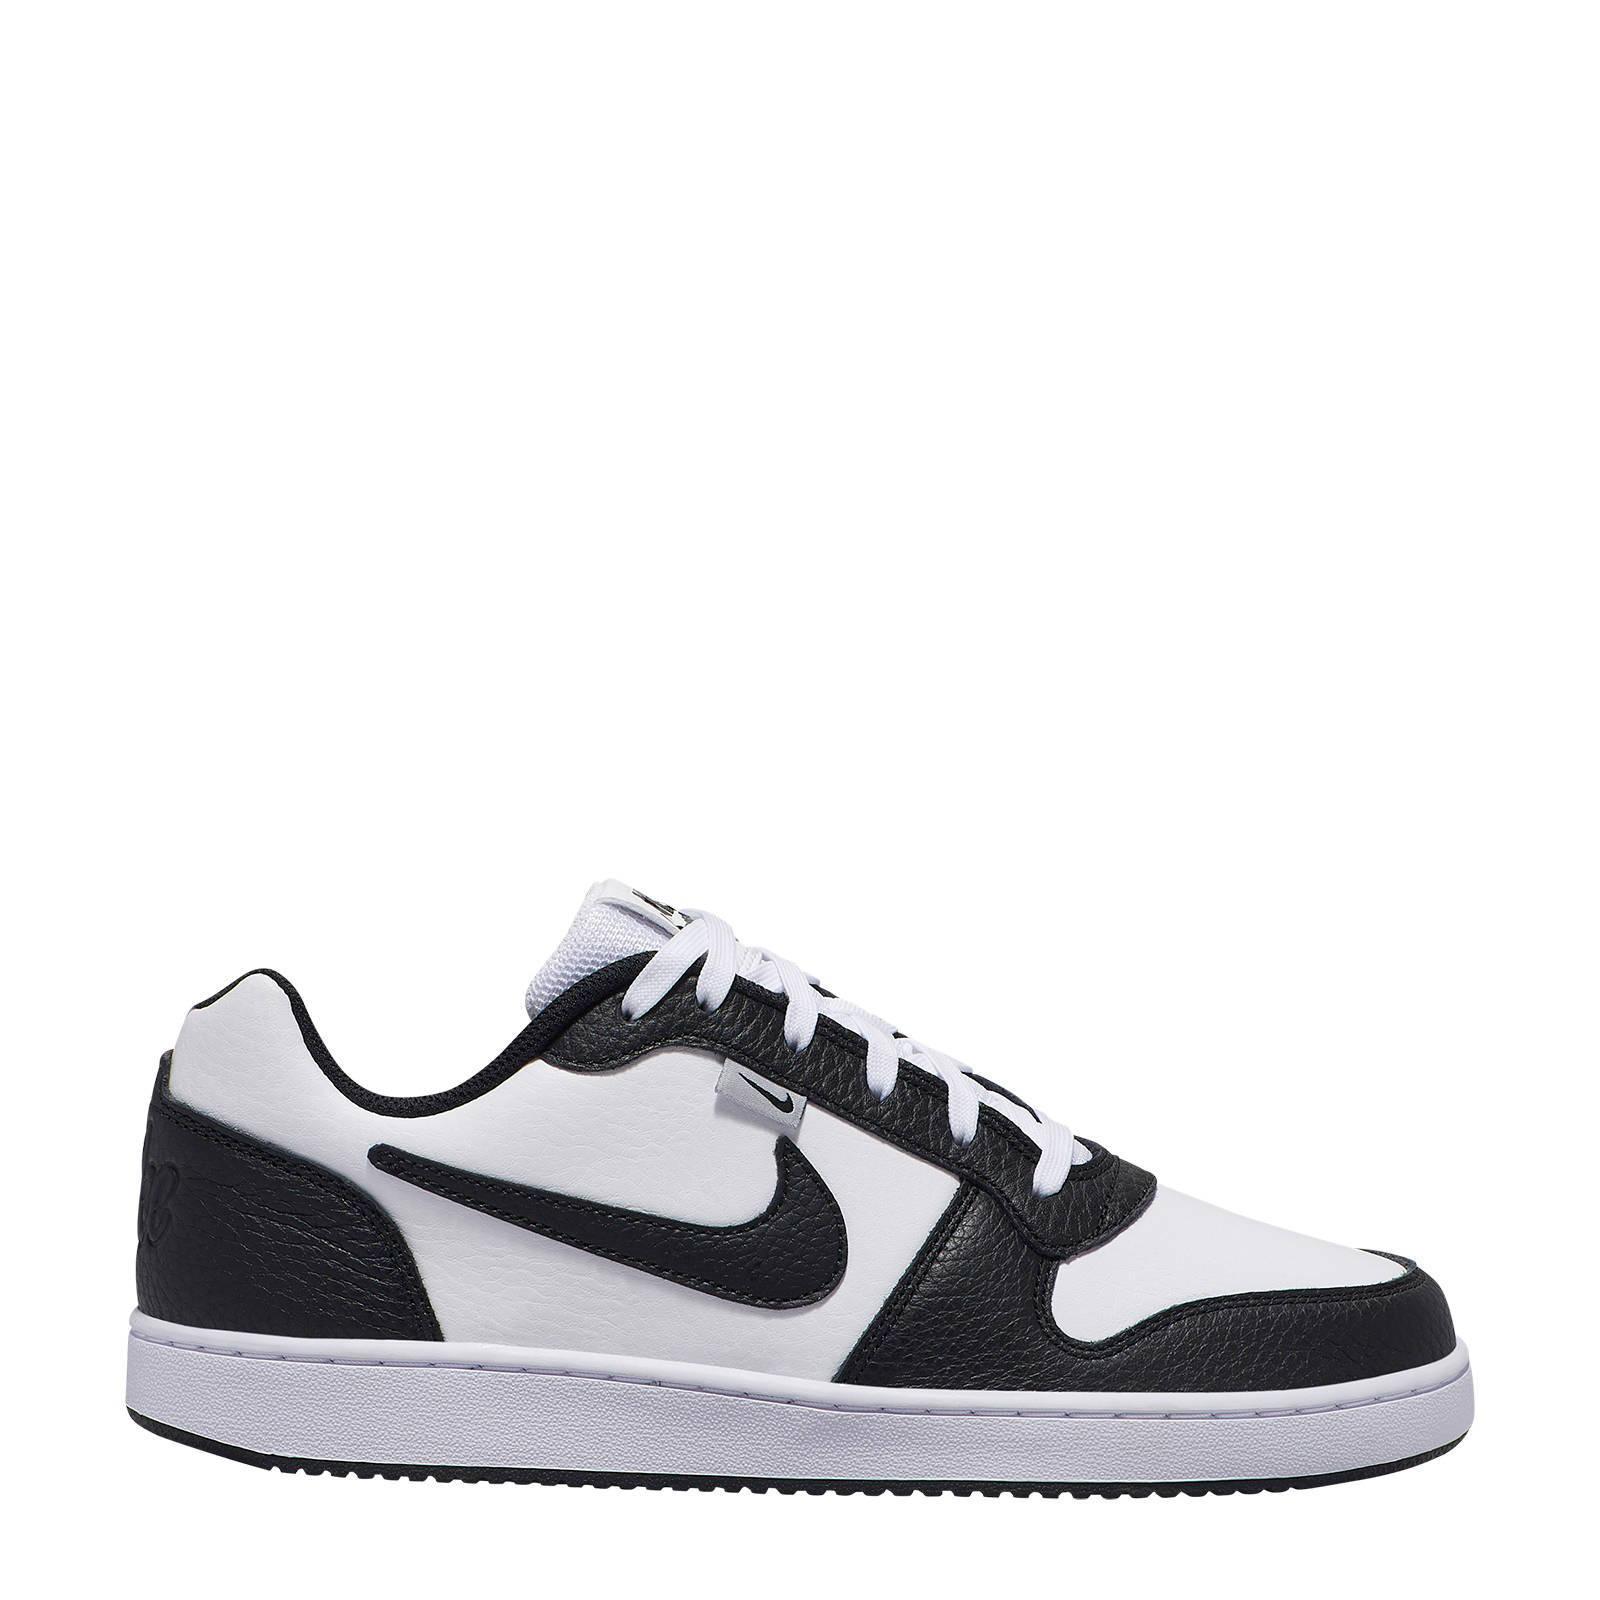 Nike EBERNON LOW PREM Ebernon Low leren sneakers wit | wehkamp